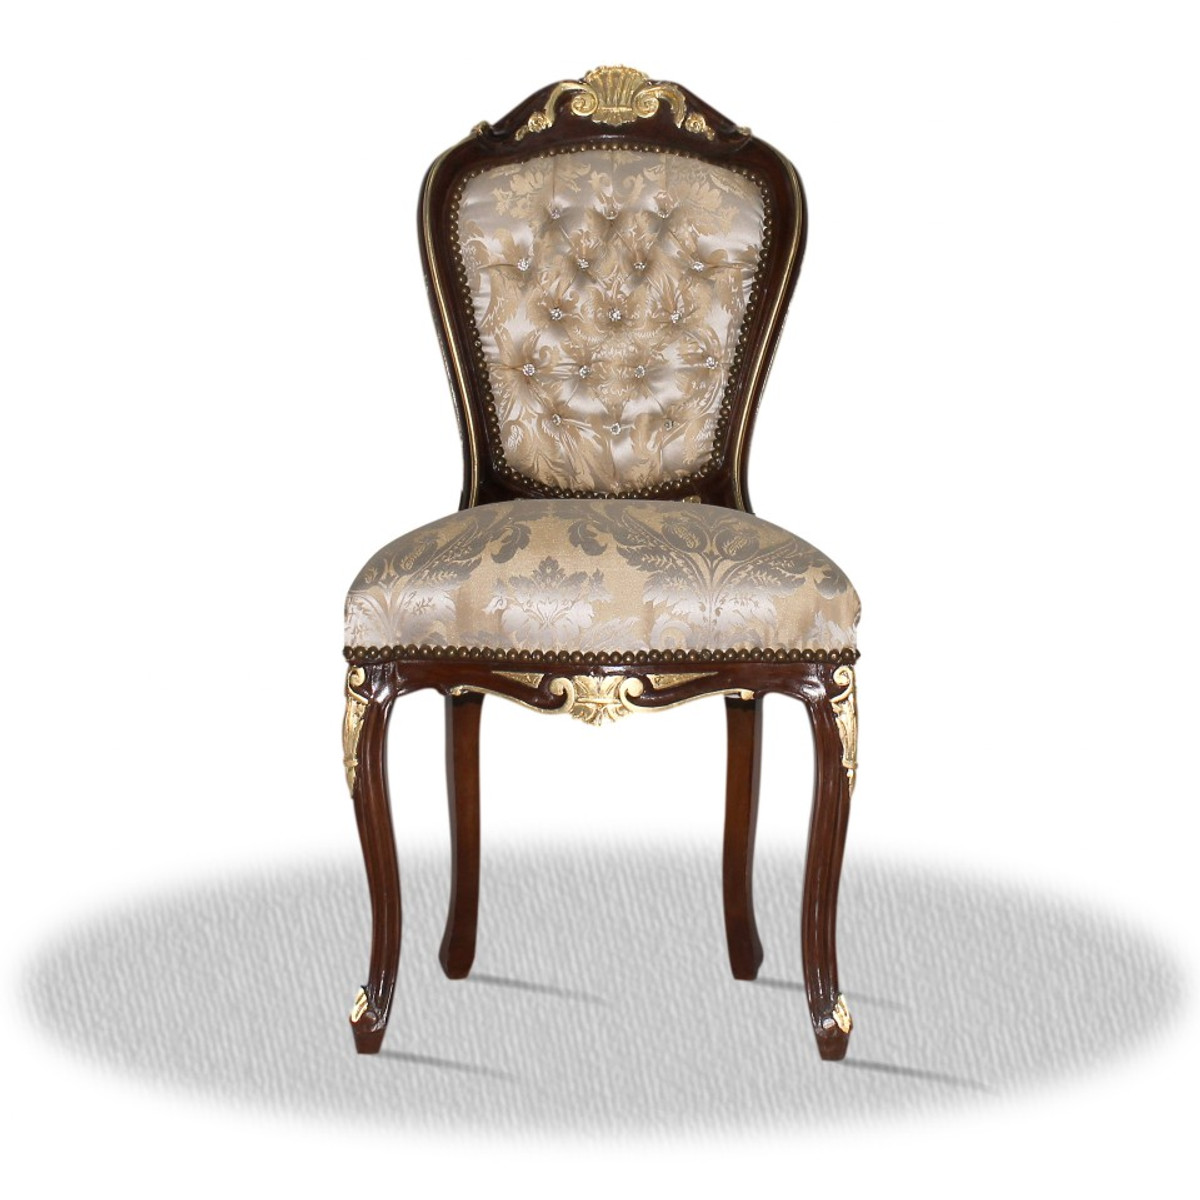 Casa Padrino Barock Esszimmerstuhl Braun Gold Silber Antik Stil Mobel